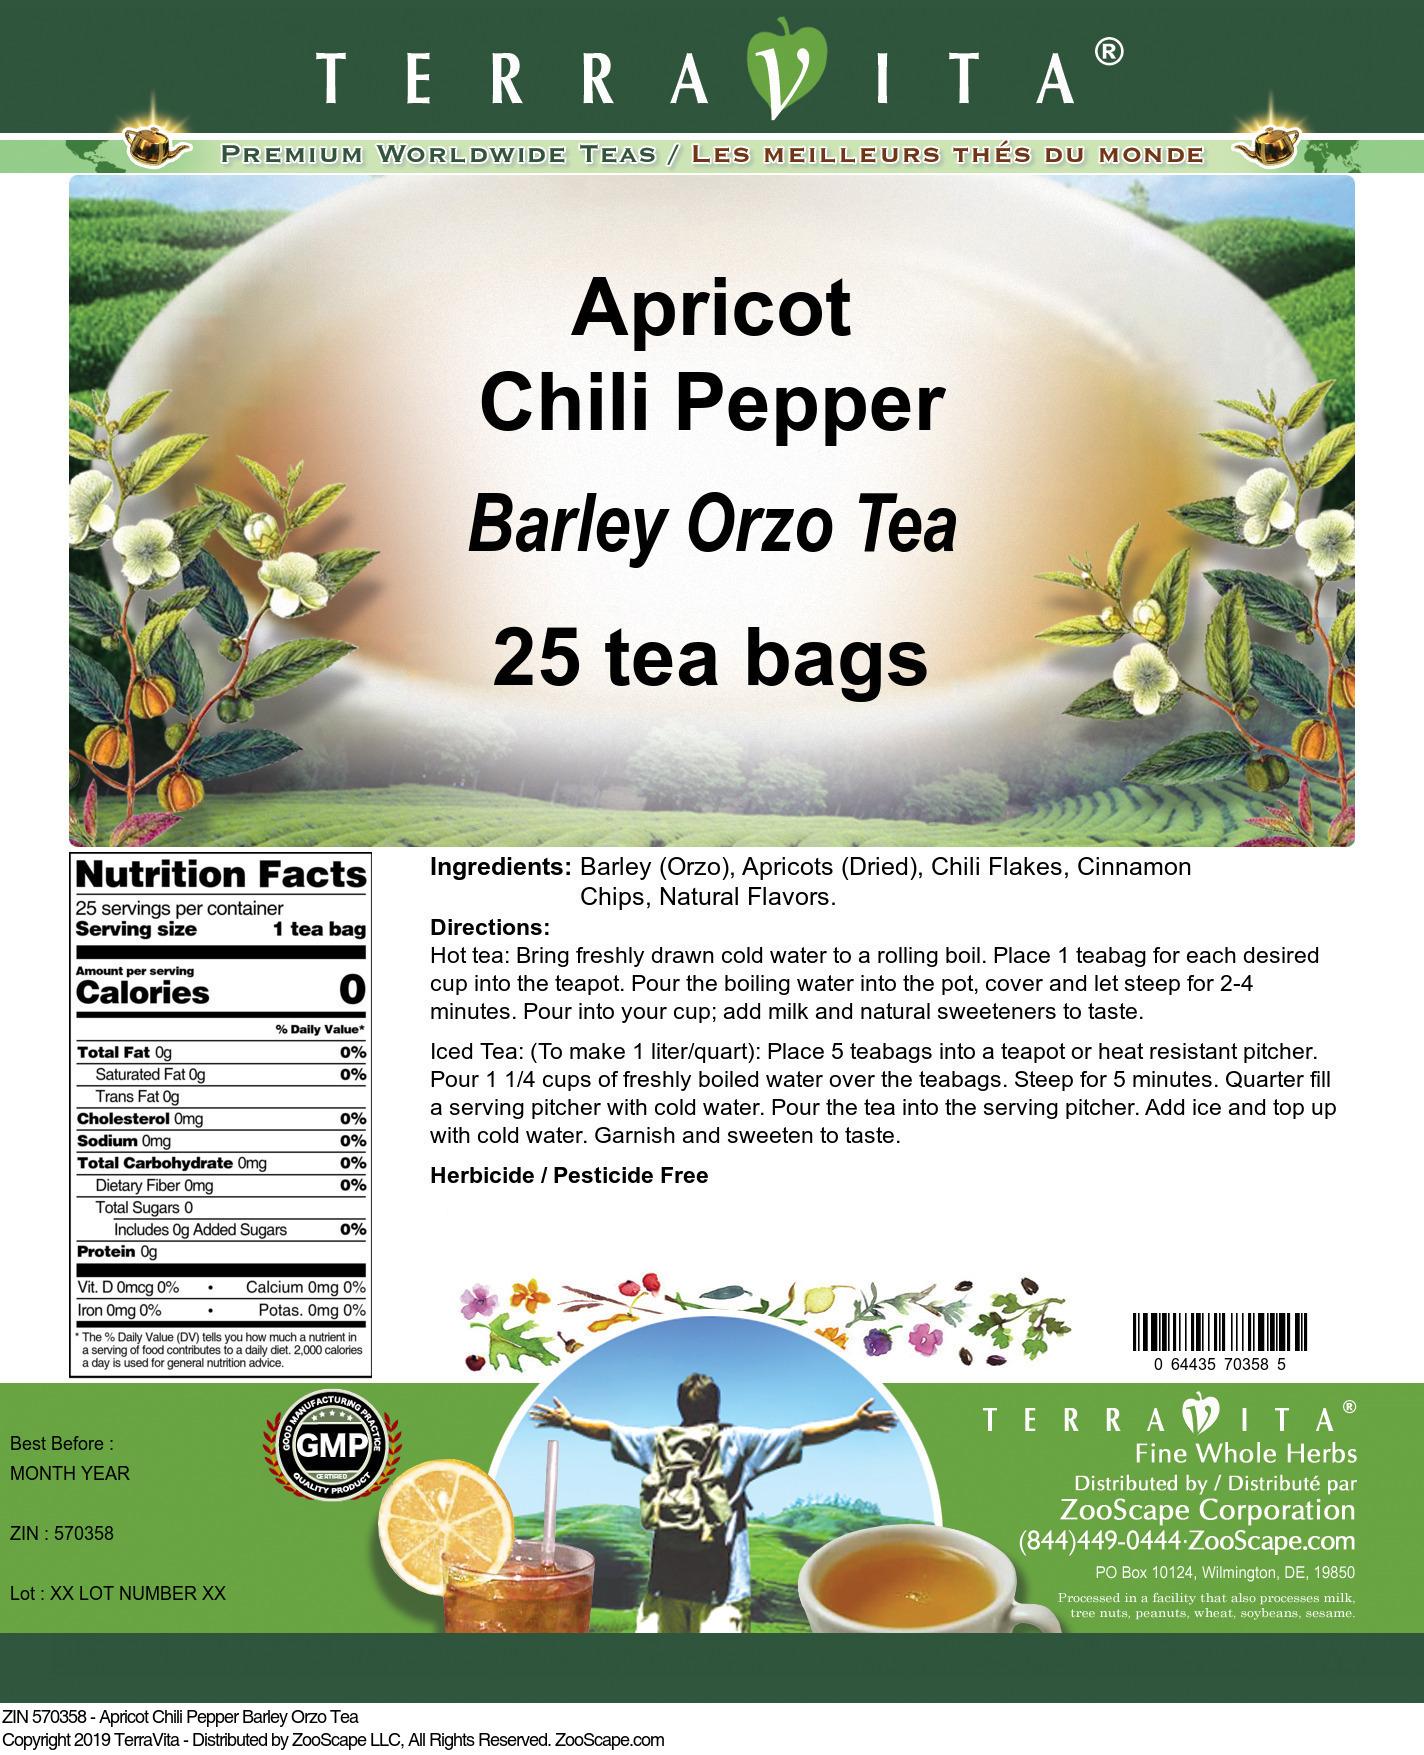 Apricot Chili Pepper Barley Orzo